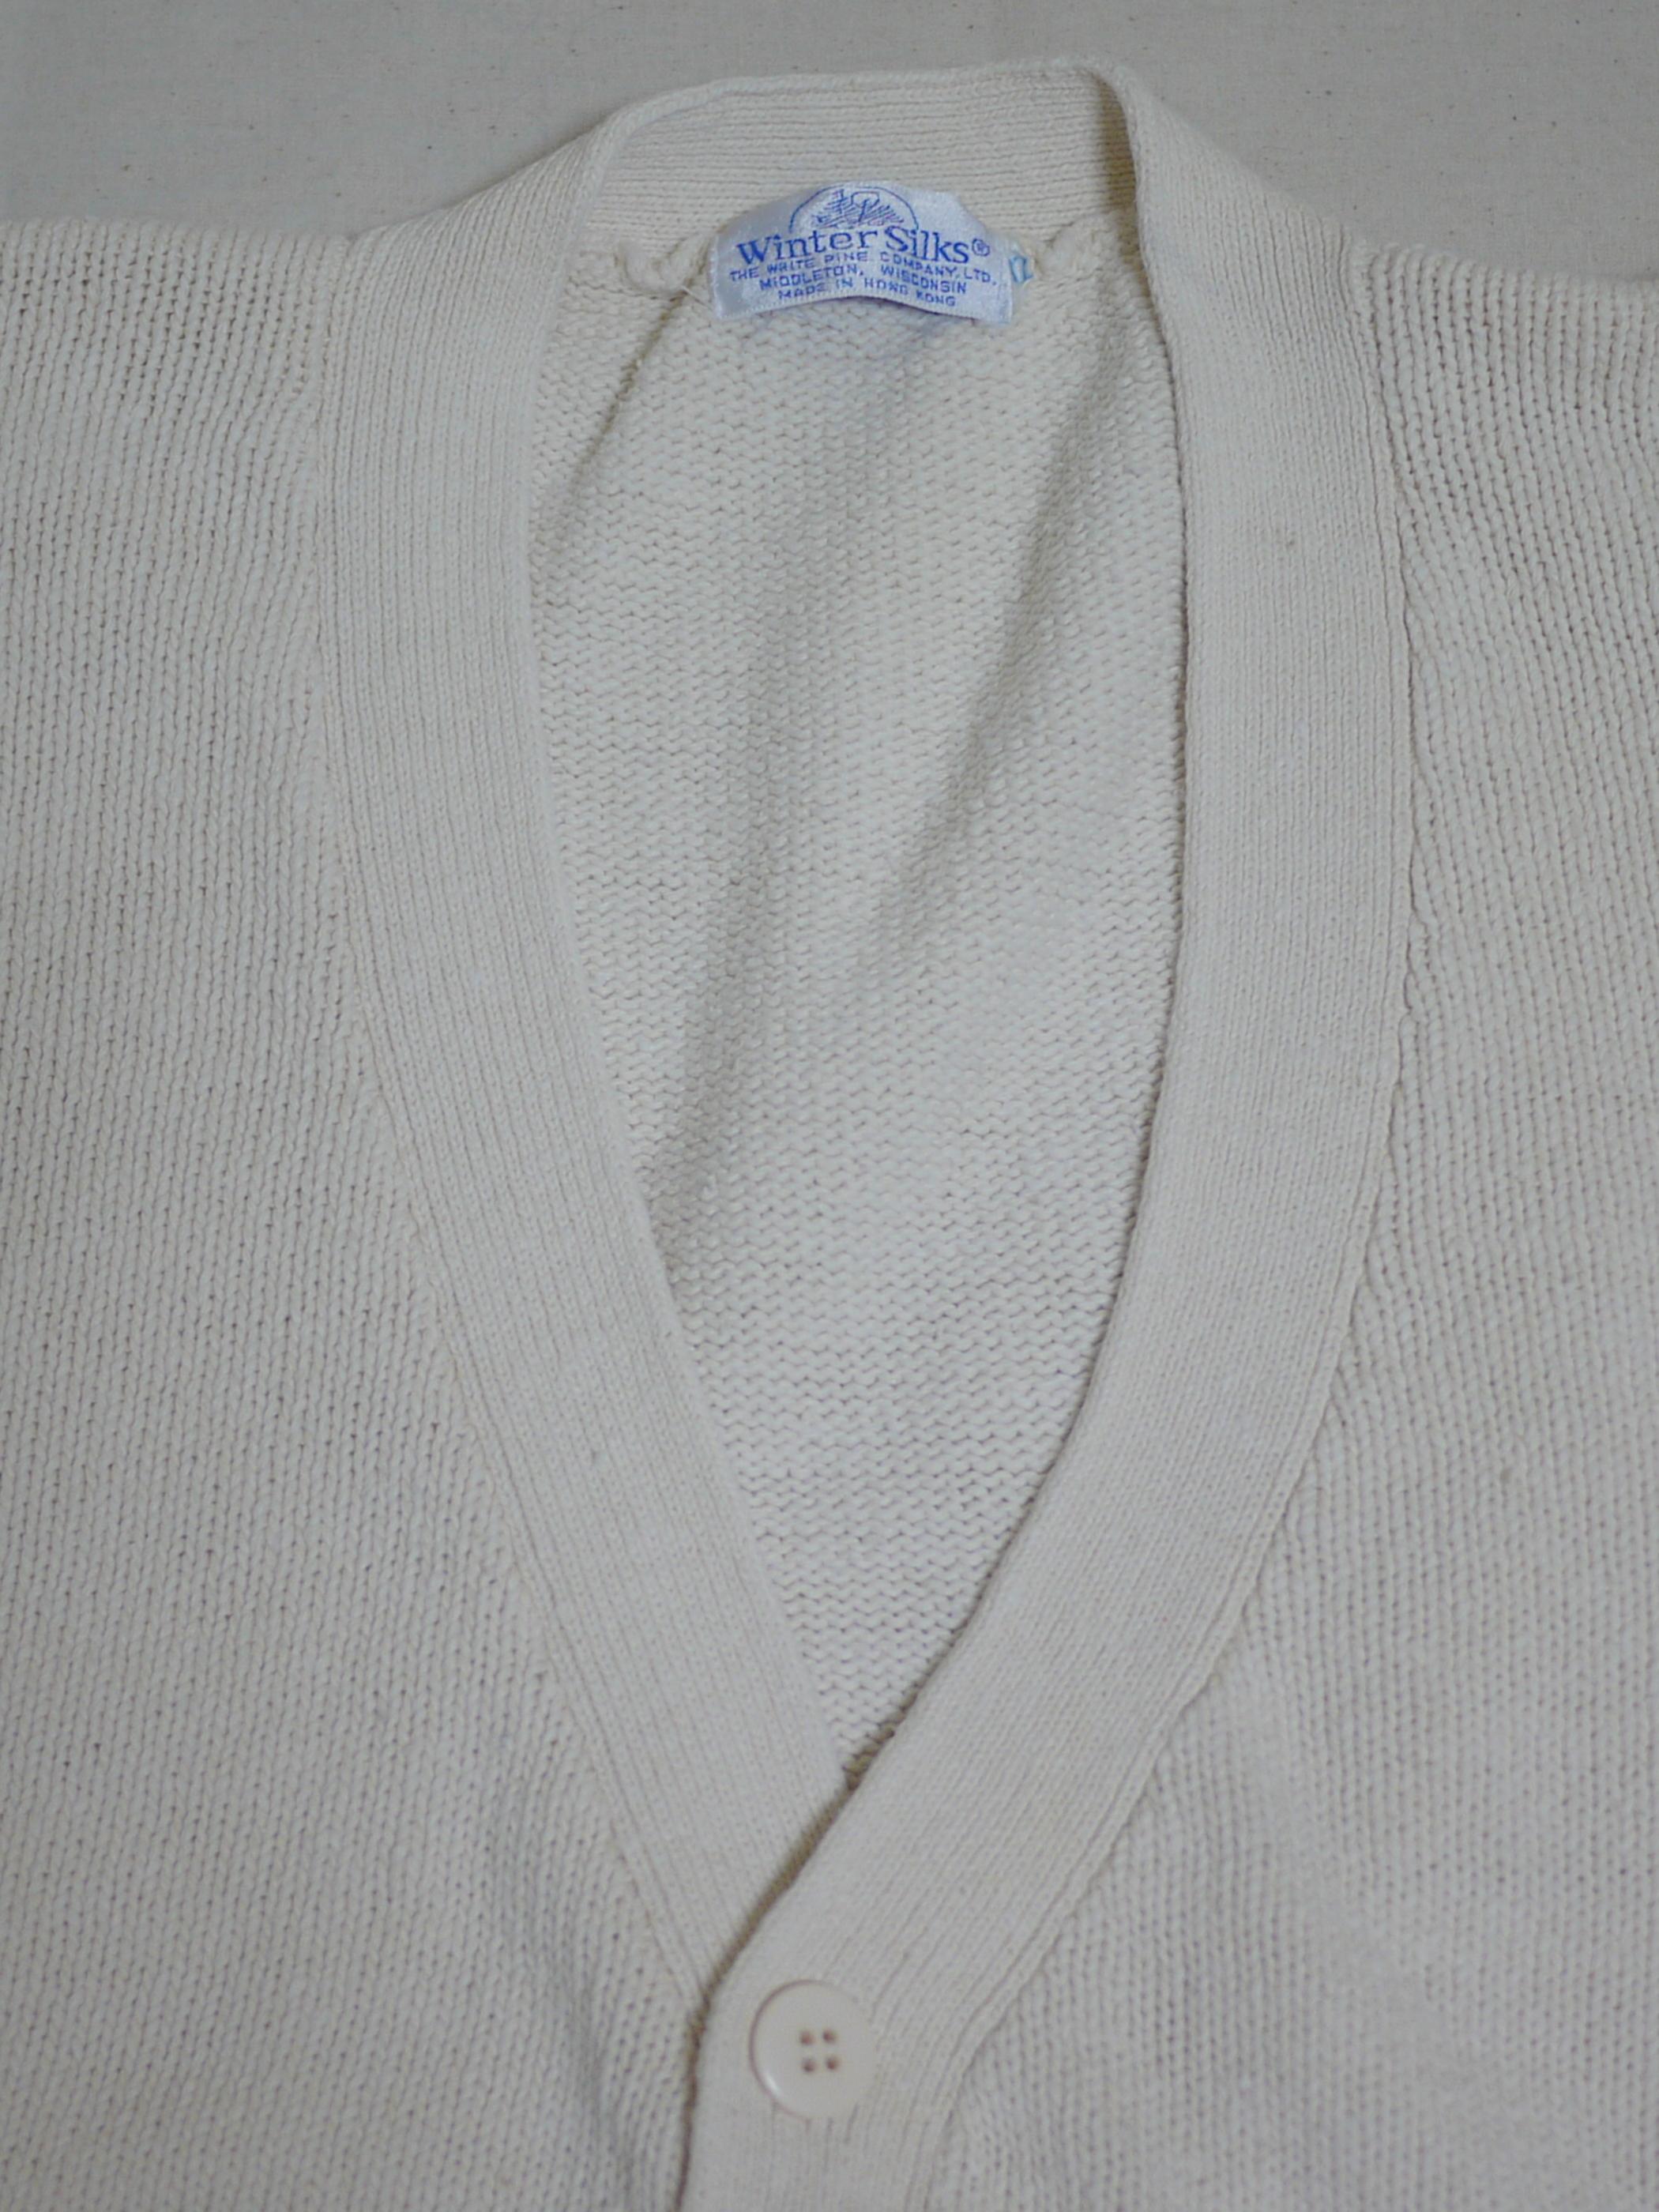 Winter Silks Cardigan SizeXL